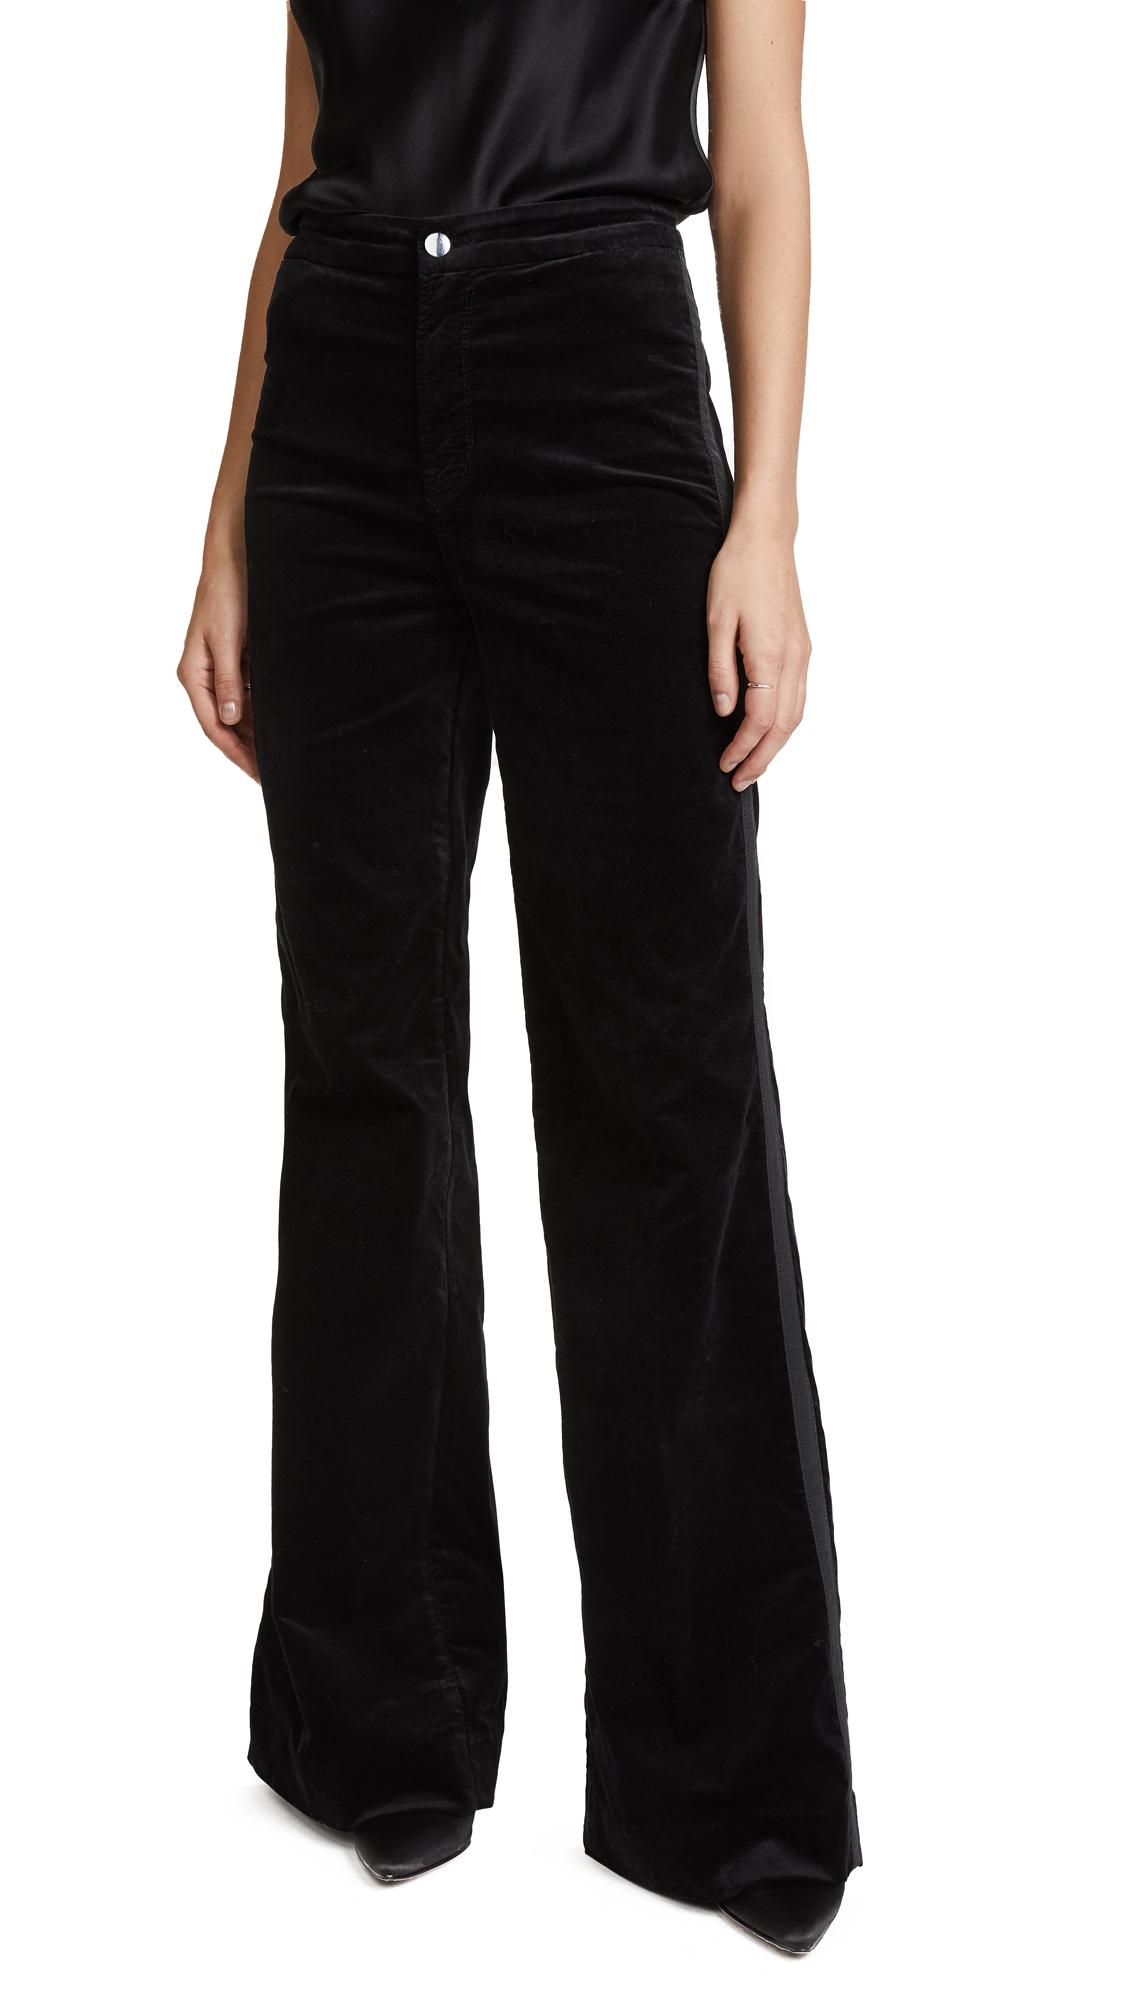 J Brand Isabella High Rise Pants - Black